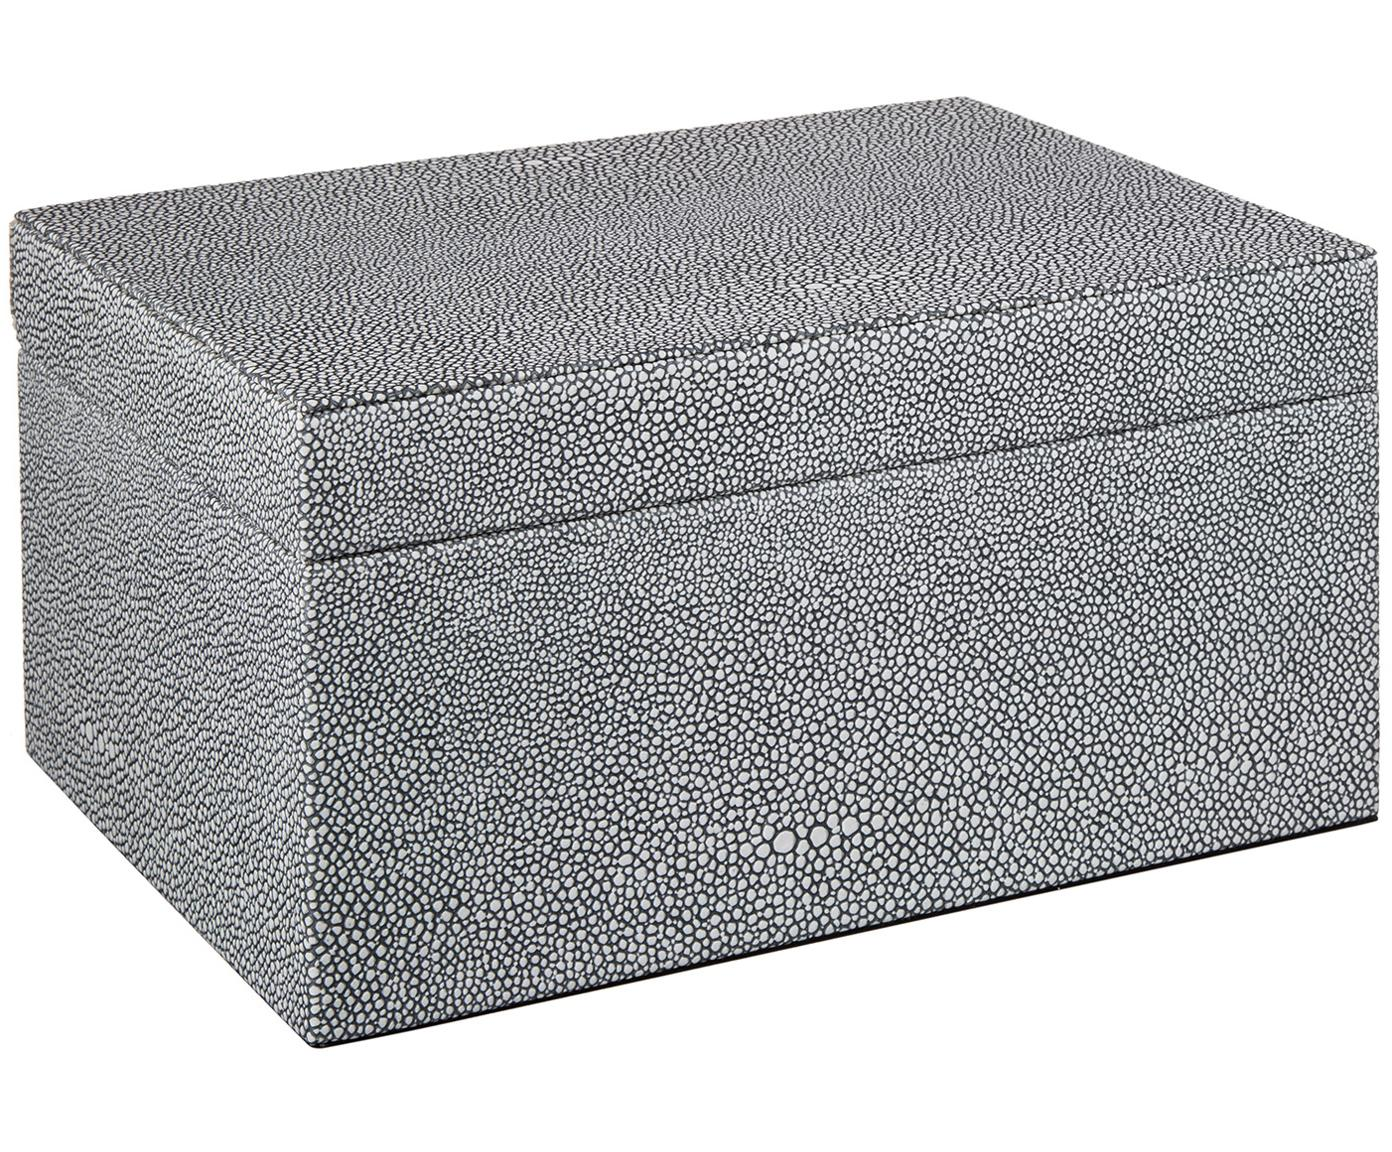 Sieradendoos Megan, Doos: medium-density fibreboard, Donkergrijs, 26 x 13 cm